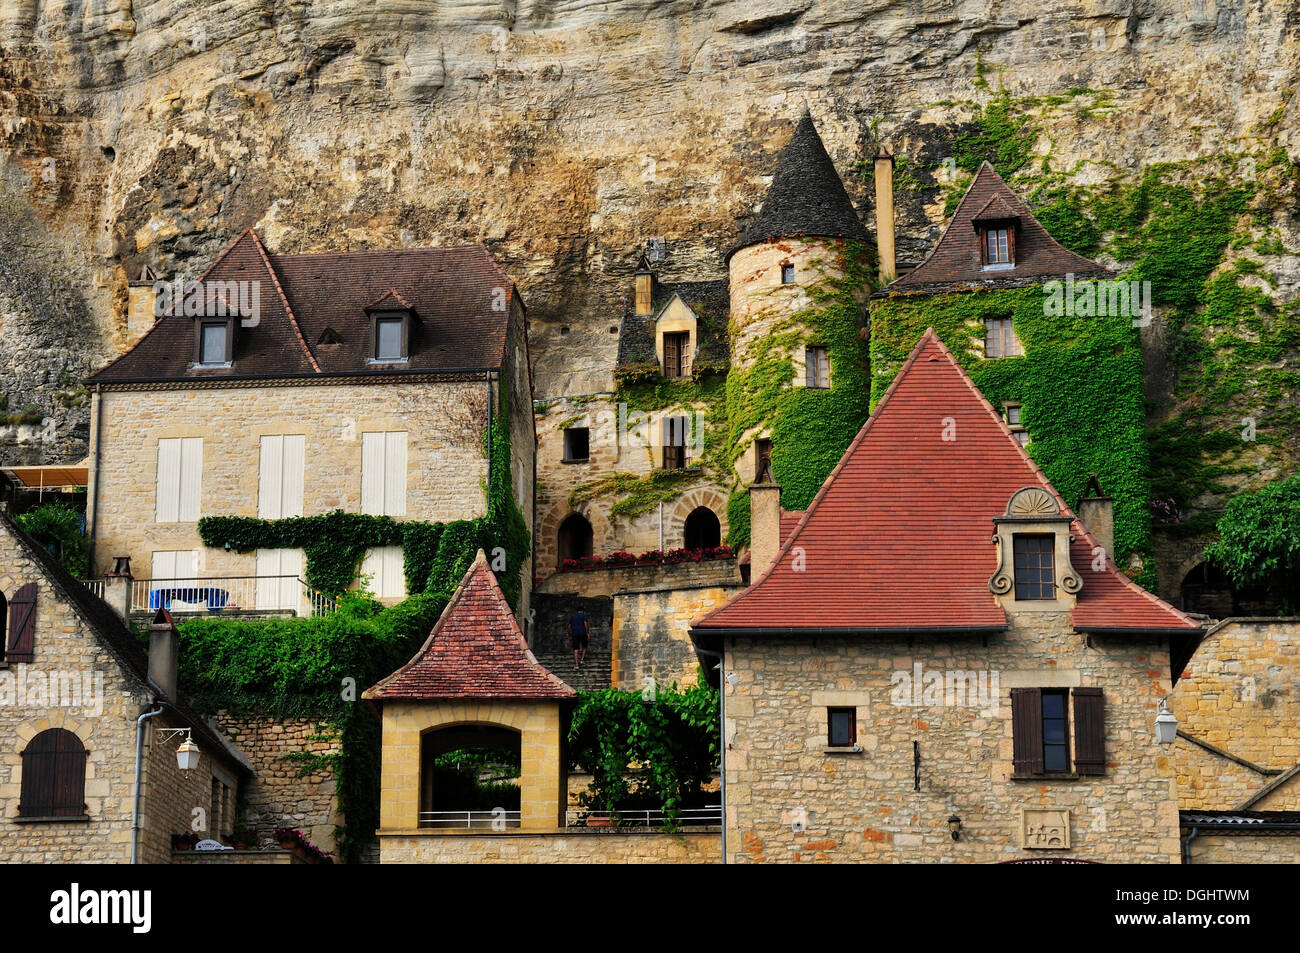 The village with the manor house 'Manoir de Tarde' in La Roque-Gageac, La Roque-Gageac, Dordogne, Aquitanien, France - Stock Image